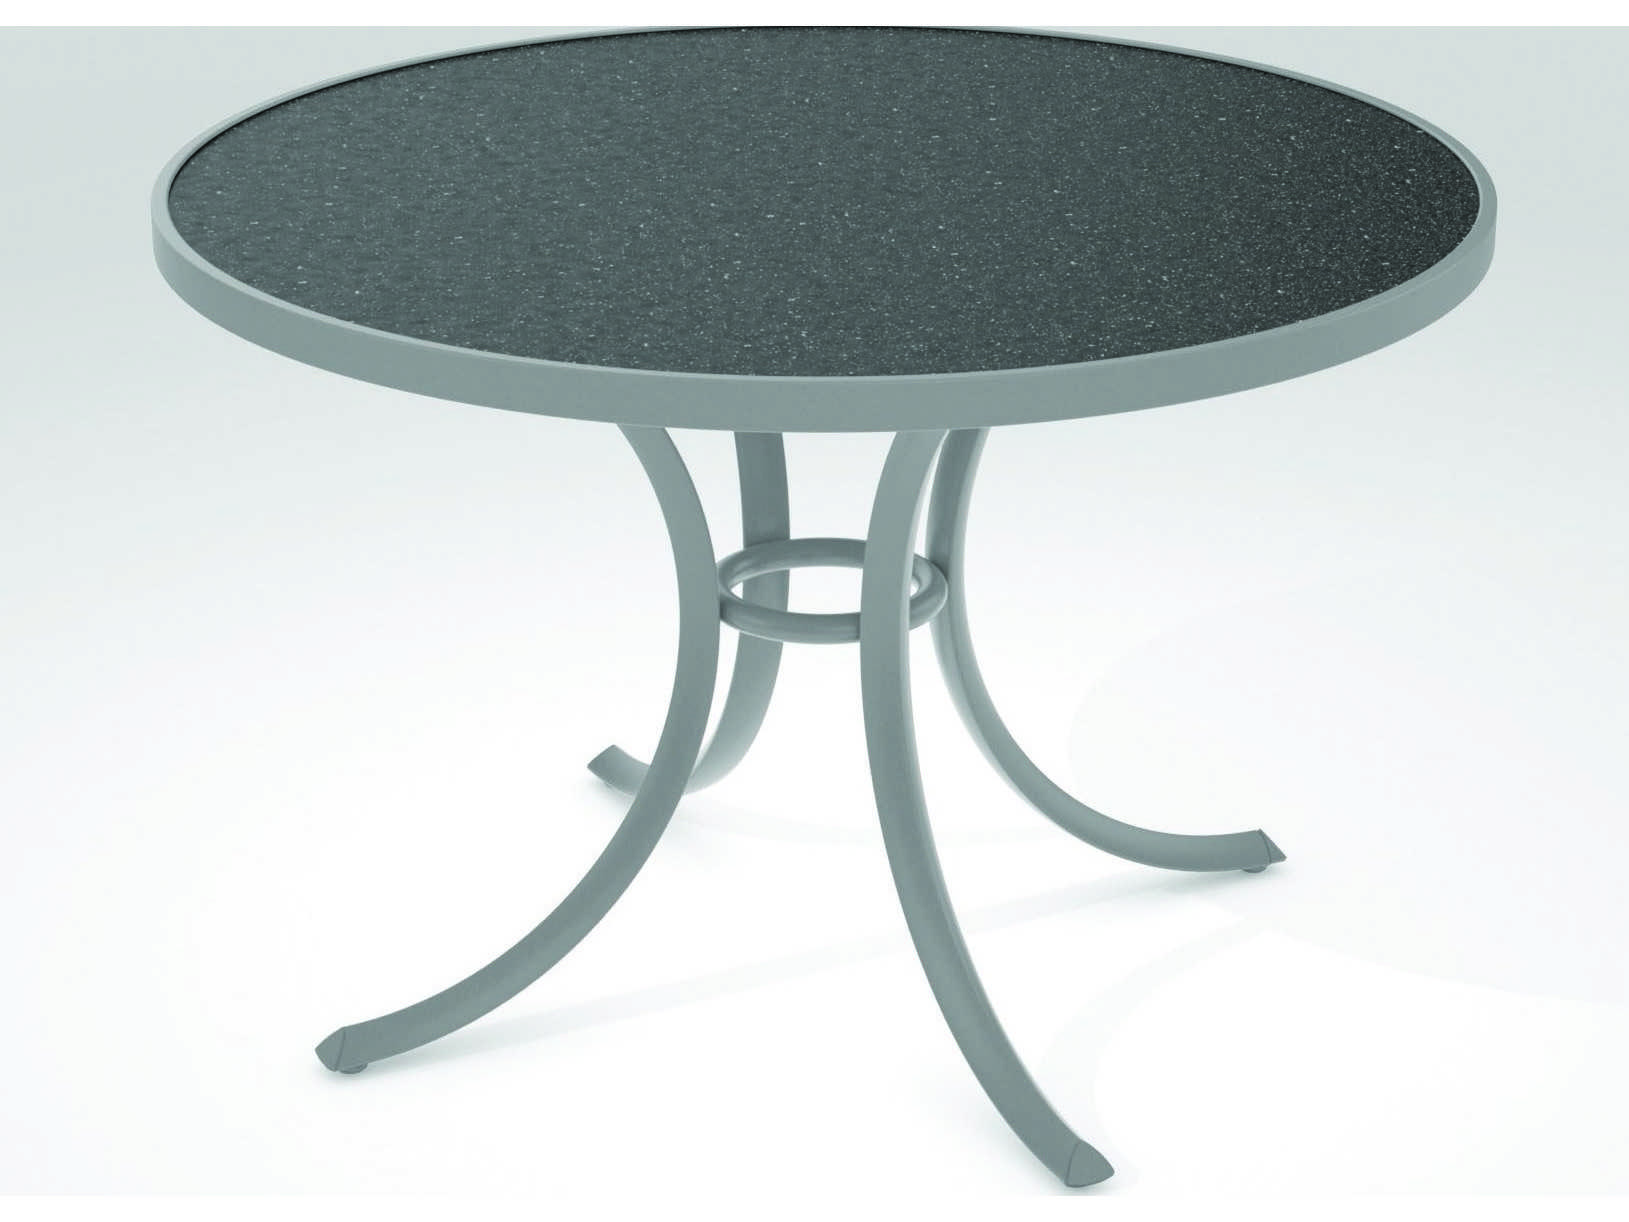 Tropitone Hpl Raduno Aluminum 42 Round Dining Table 1842h